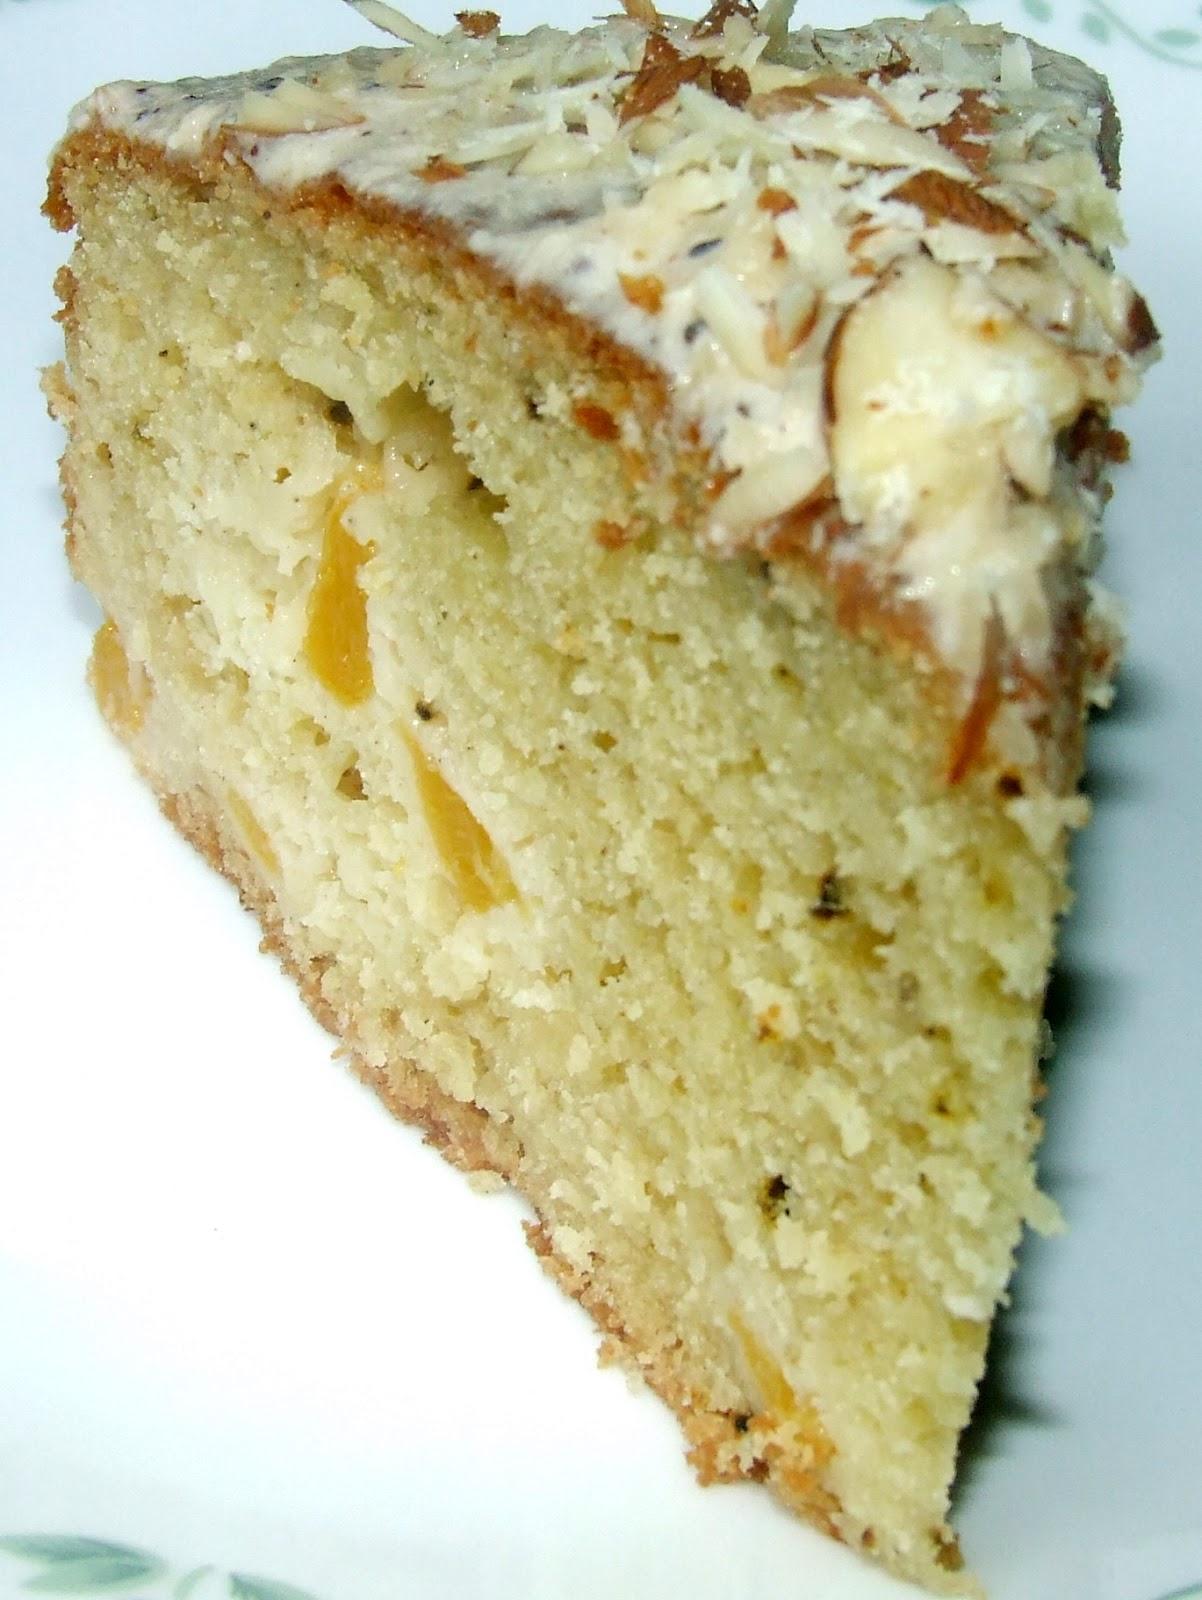 AMBROSIA: Peach Yogurt Cake With Cinnamon Glaze